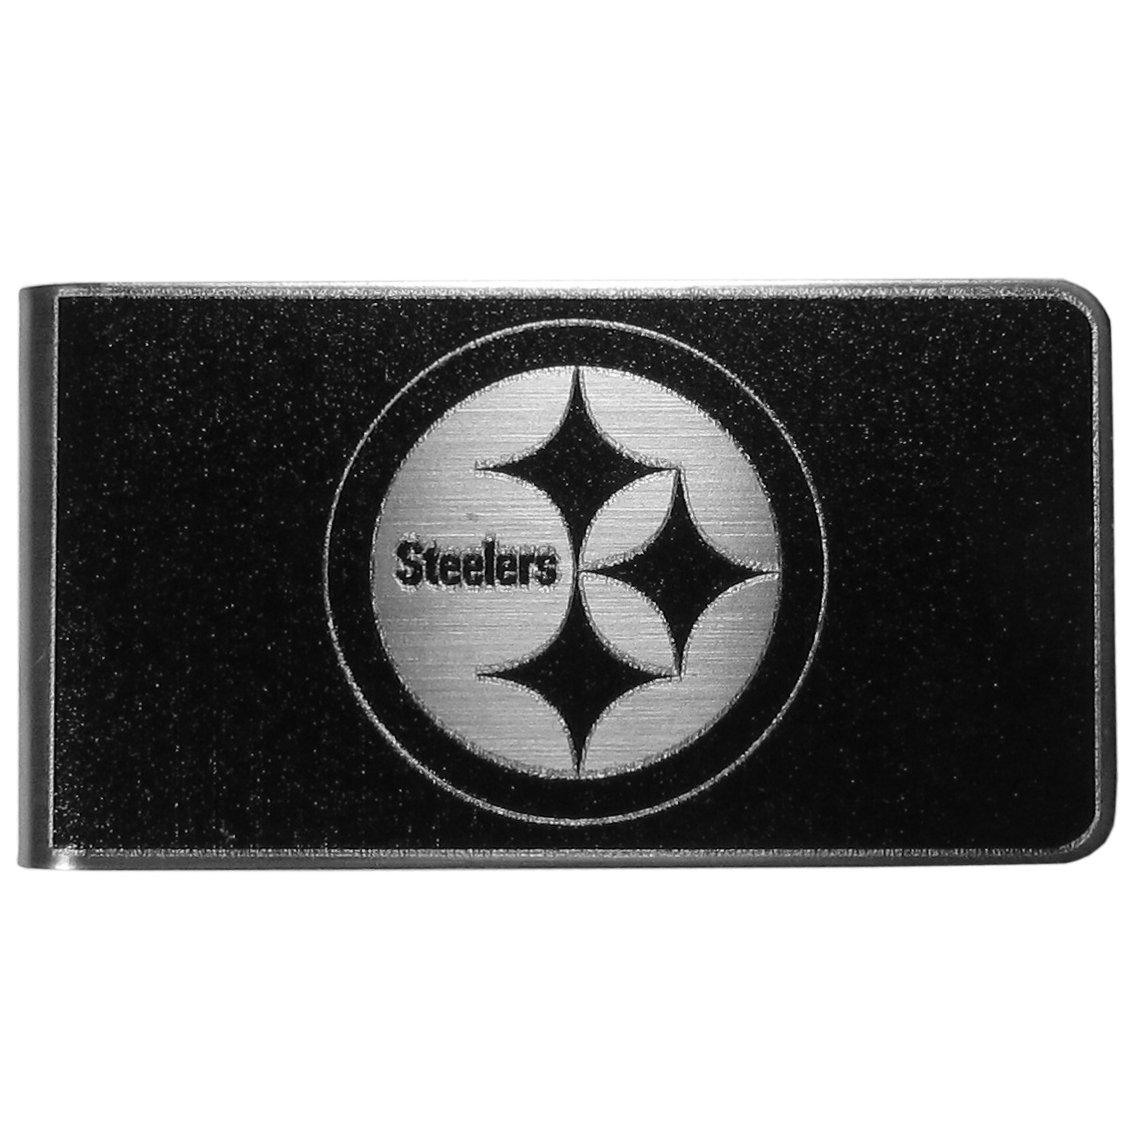 Siskiyou Herren Sport Pittsburgh Steelers Stahl Geld Clip, groß, Schwarz groß Siskiyou Gifts Co Inc. FBKM160